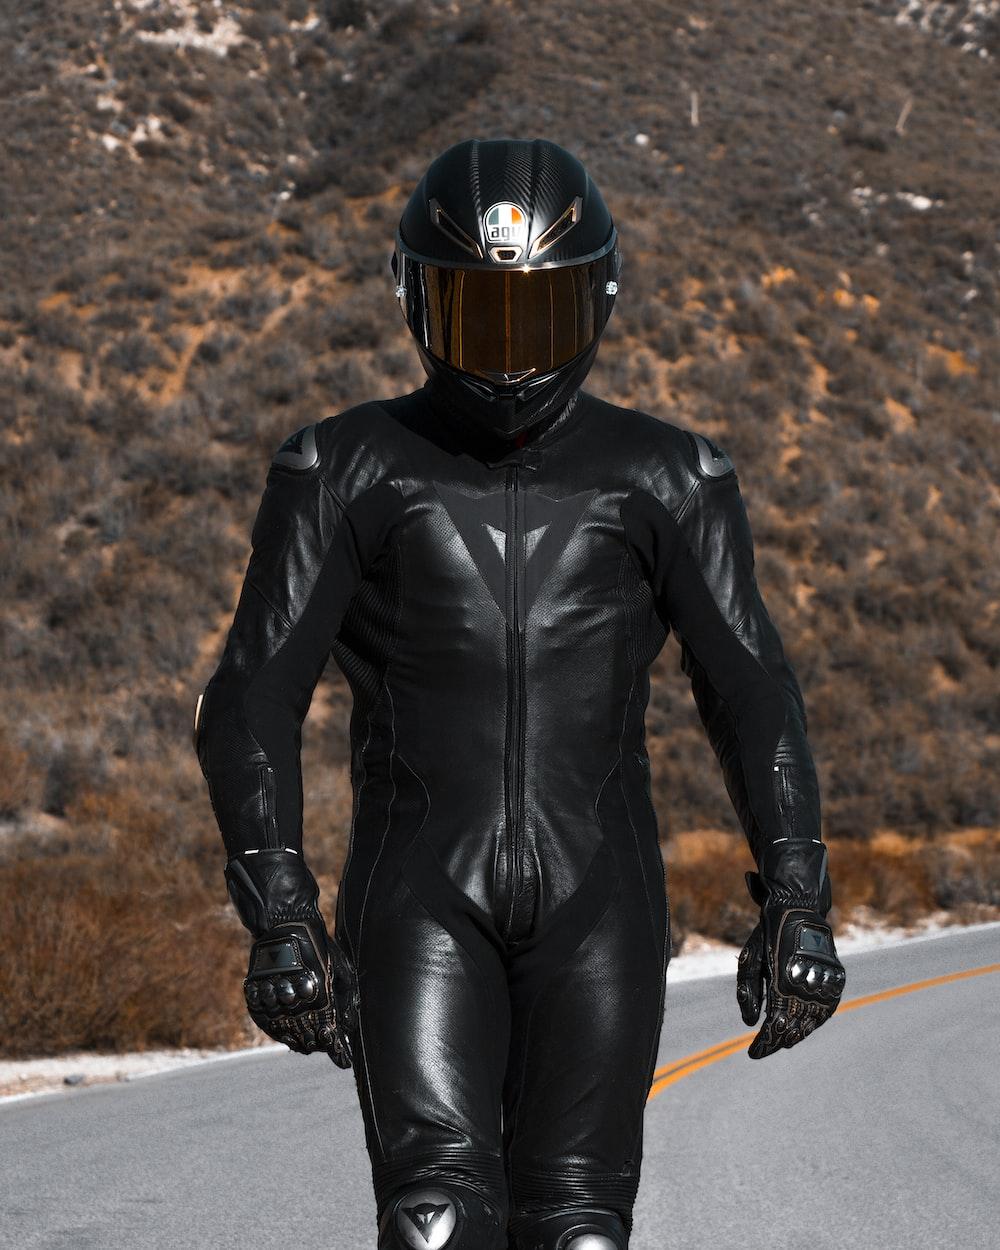 man in black leather jacket wearing helmet